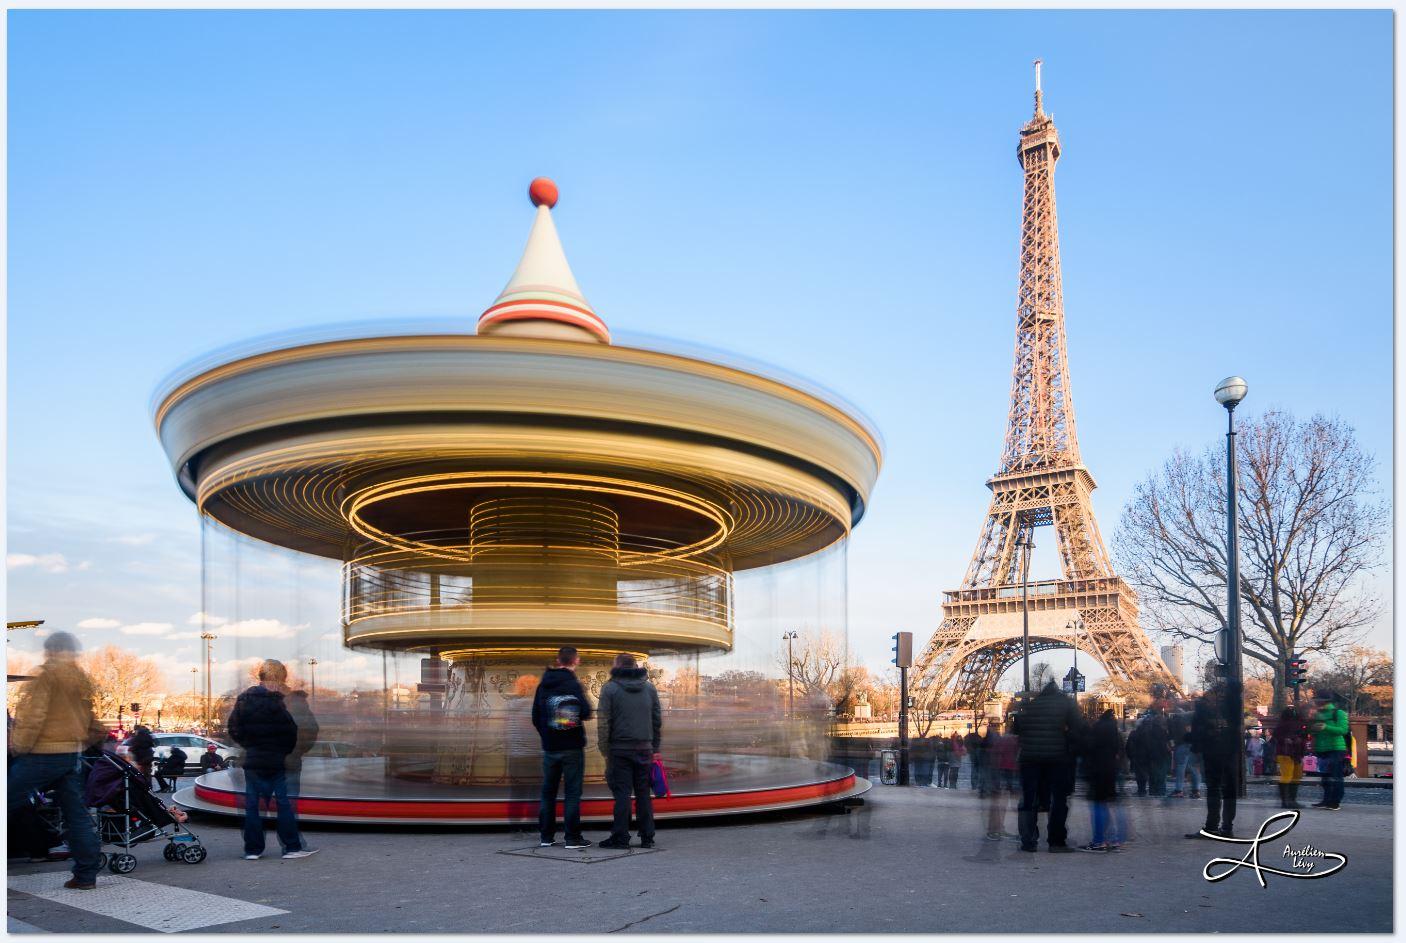 Eiffel Tower's Carroussel, France